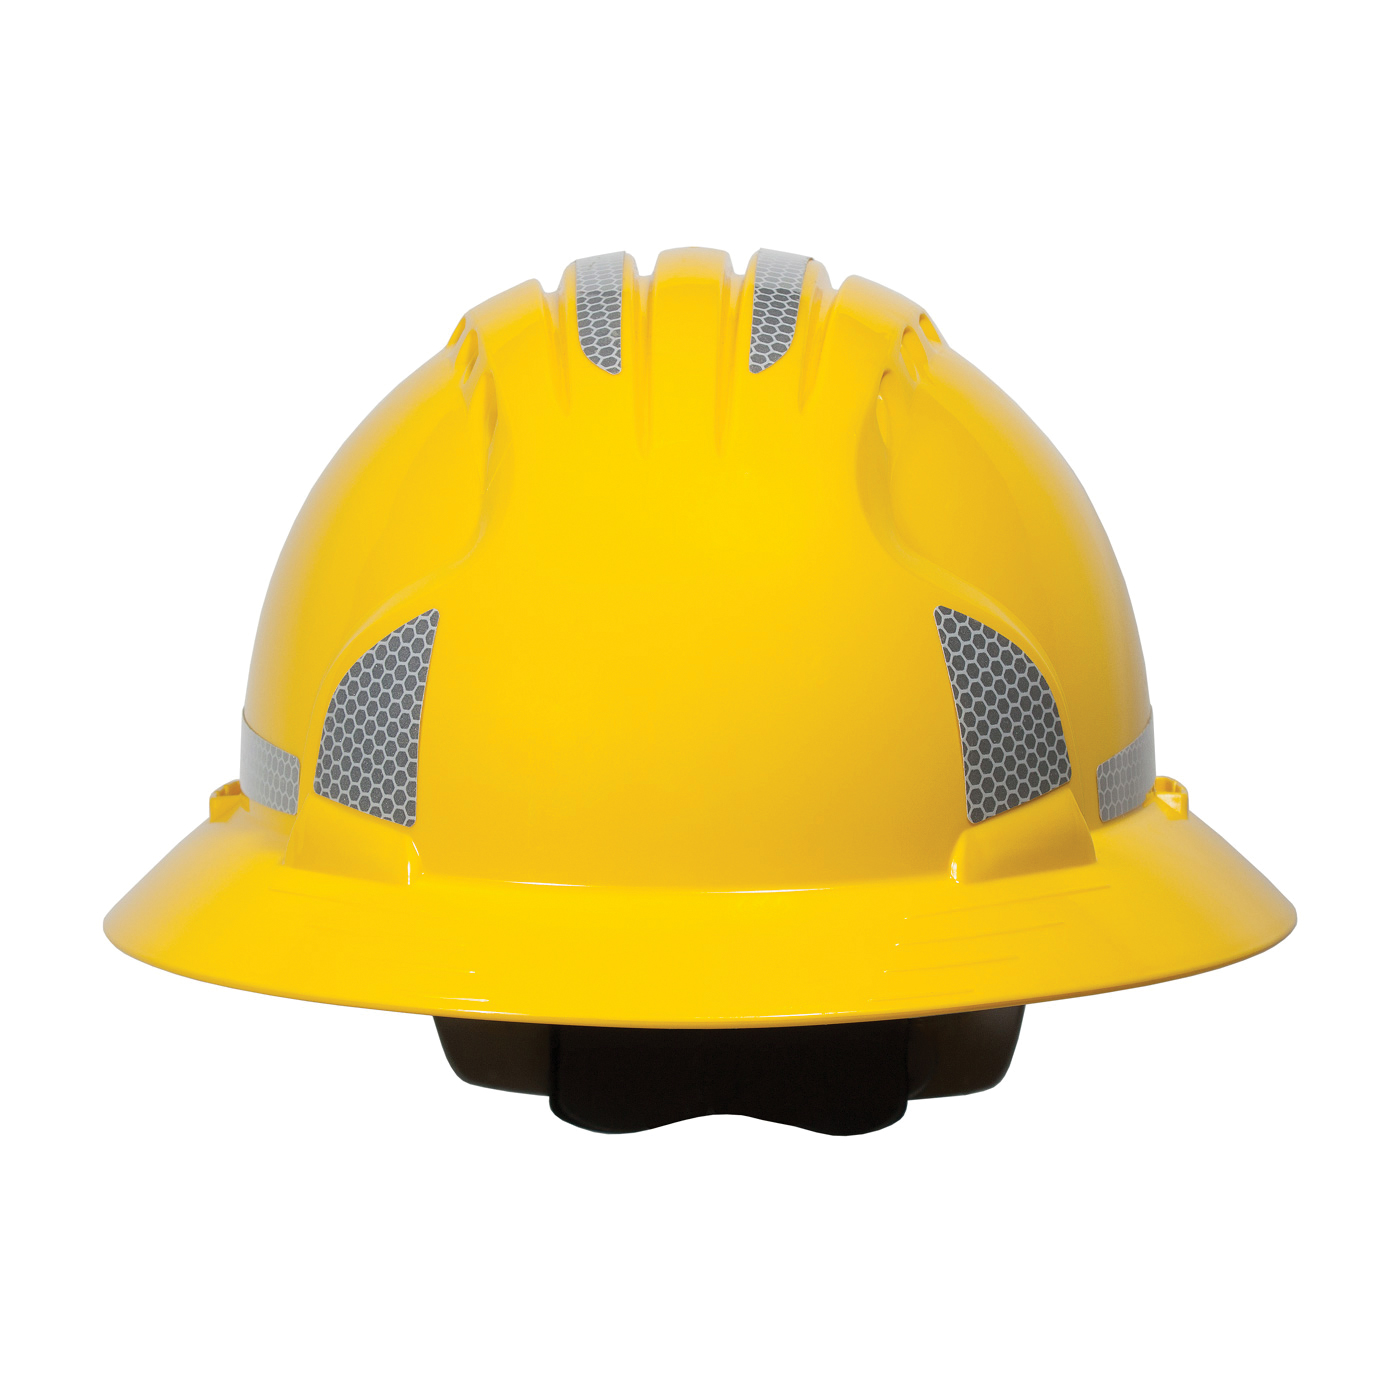 JSP® 281-CR2FB-10 Reflective Kit, Silver